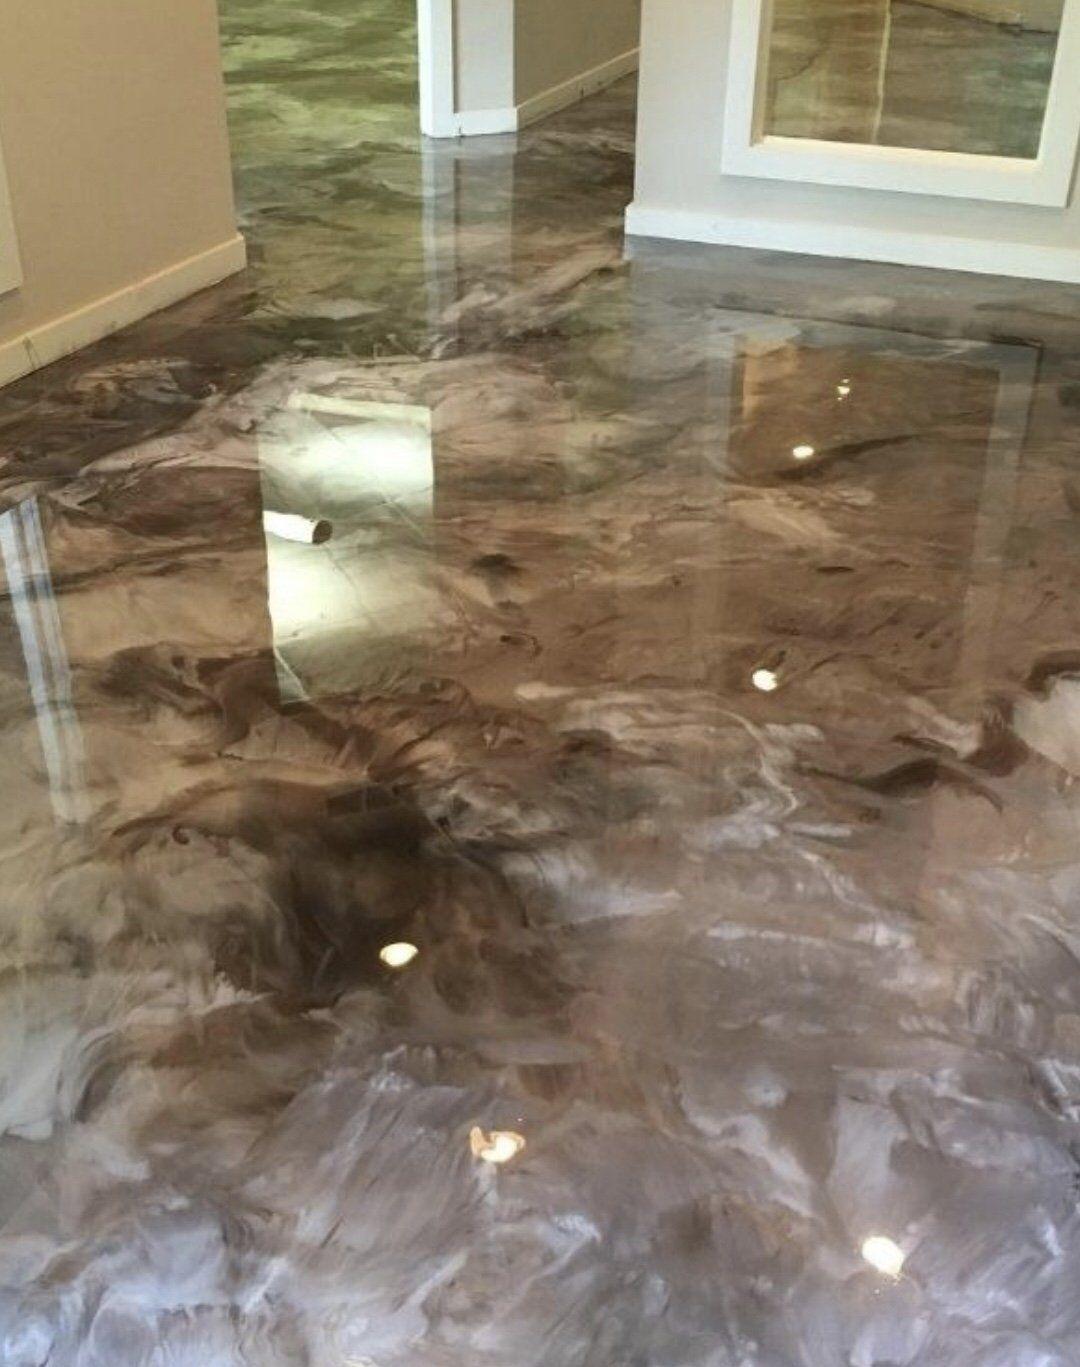 Cti Northeastern Contractors Llc In 2020 Epoxy Floor Metallic Epoxy Floor Epoxy Floor Coating